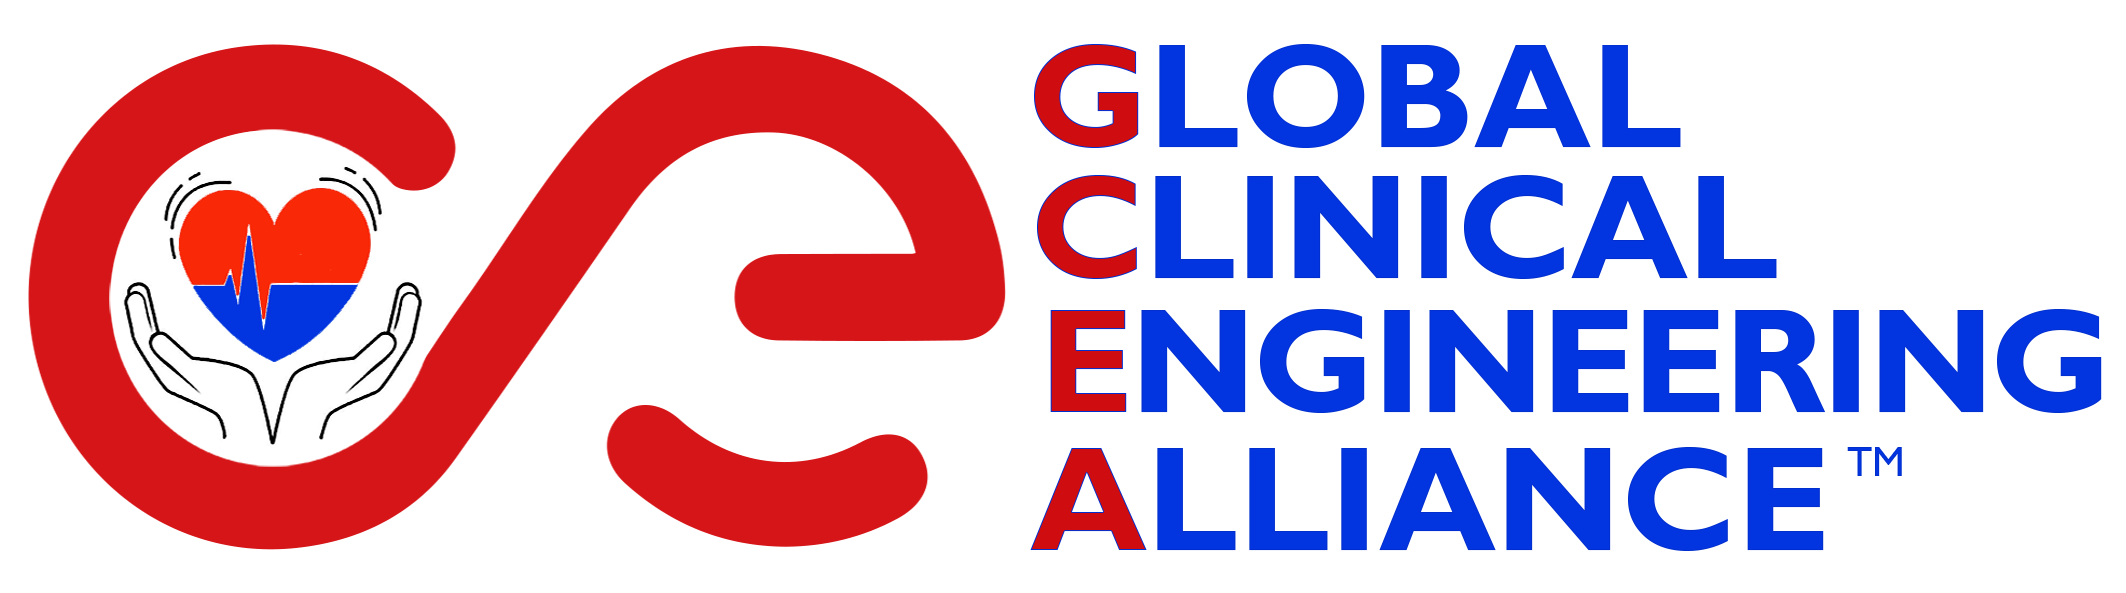 Global CE Alliance logov_TM